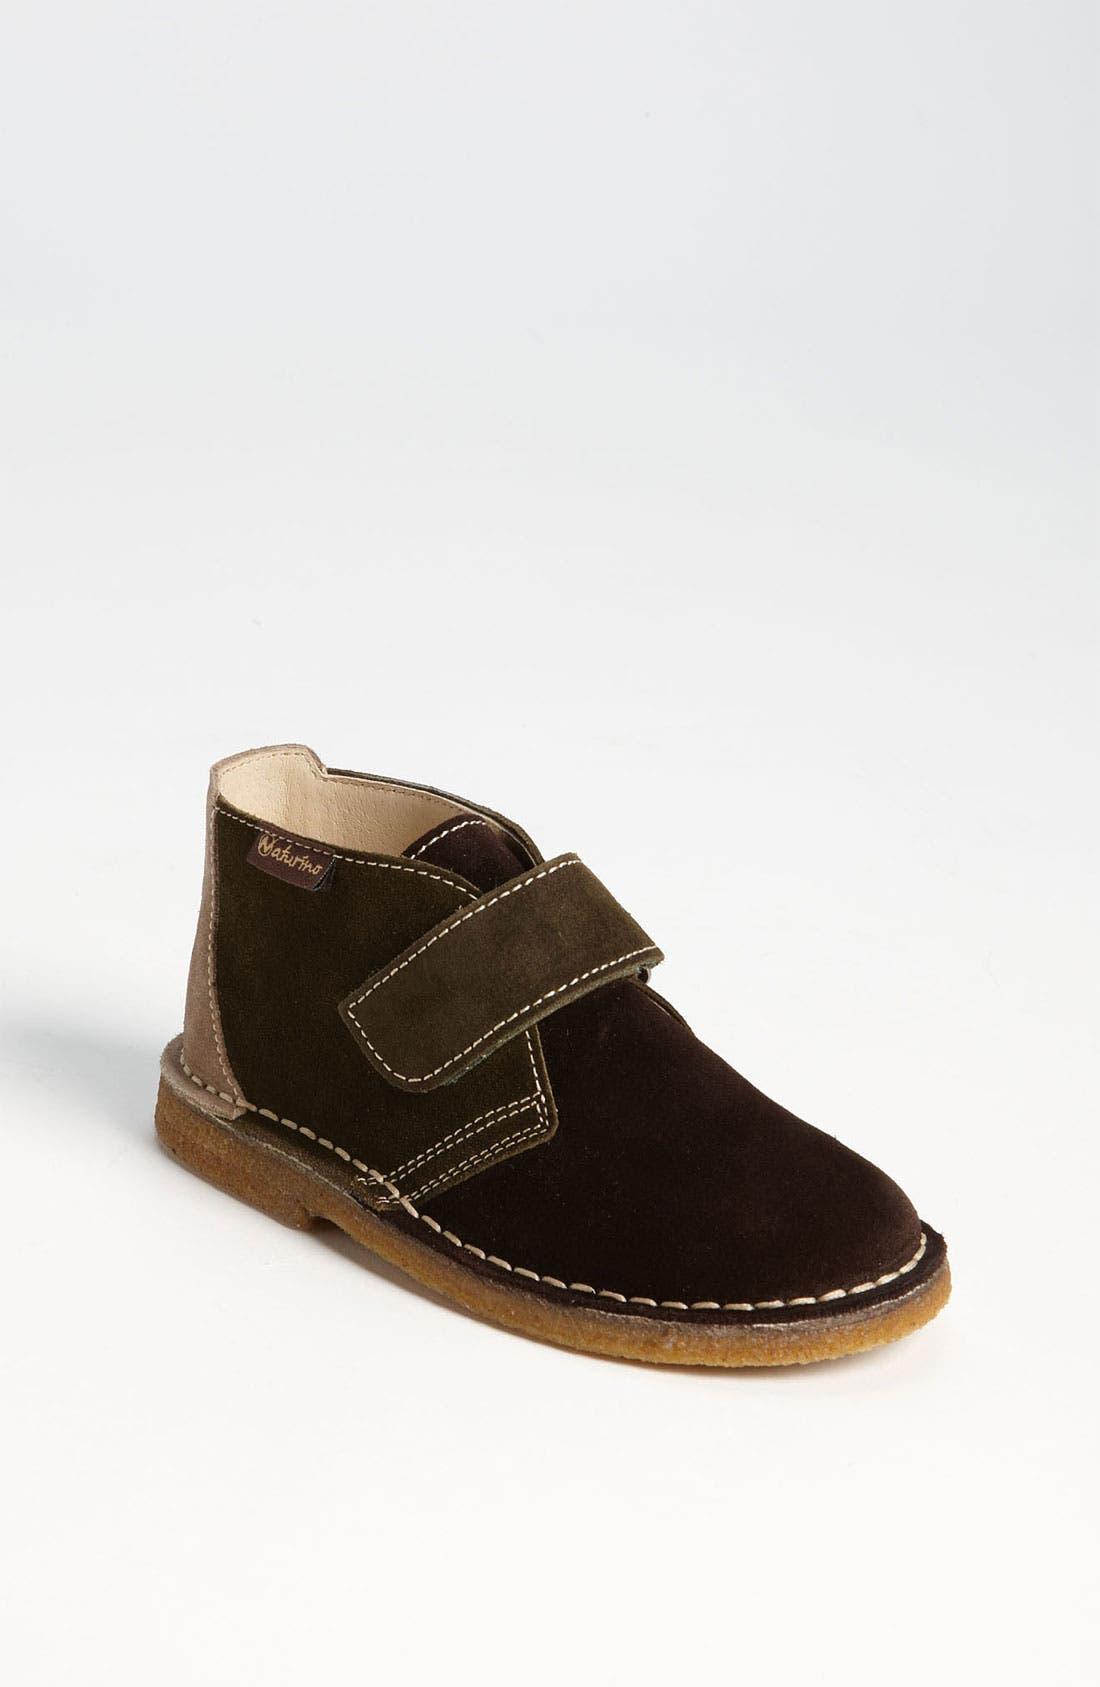 Alternate Image 1 Selected - Naturino '4201' Boot (Walker & Toddler)